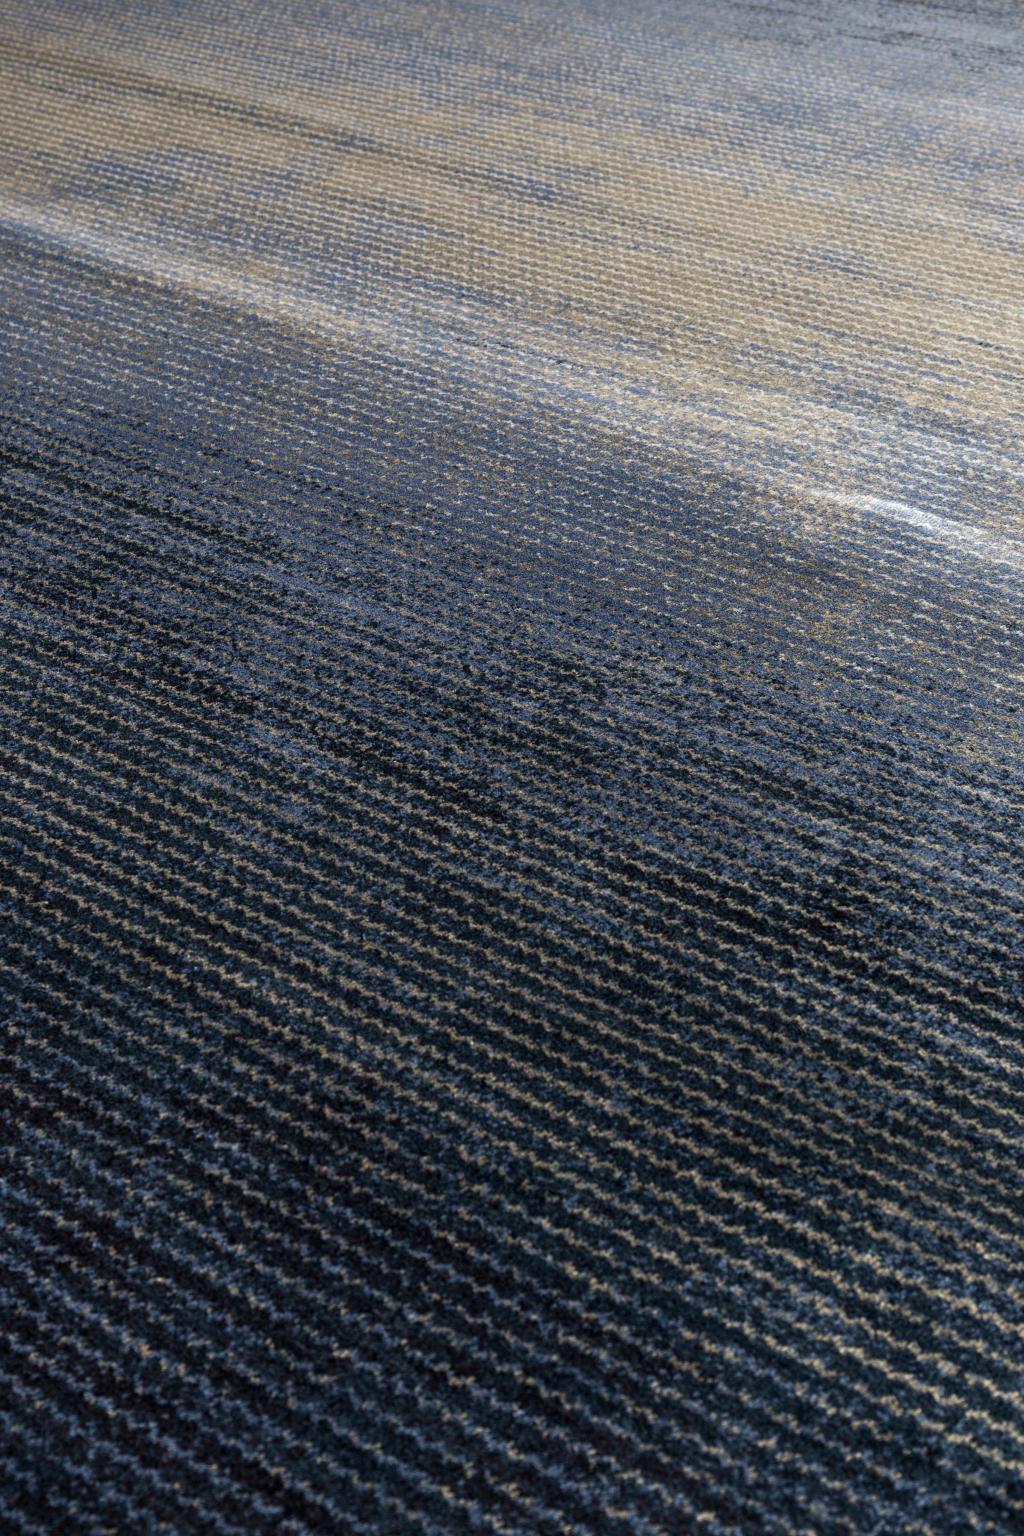 zuiver teppich obi blau 200 x 300 cm. Black Bedroom Furniture Sets. Home Design Ideas